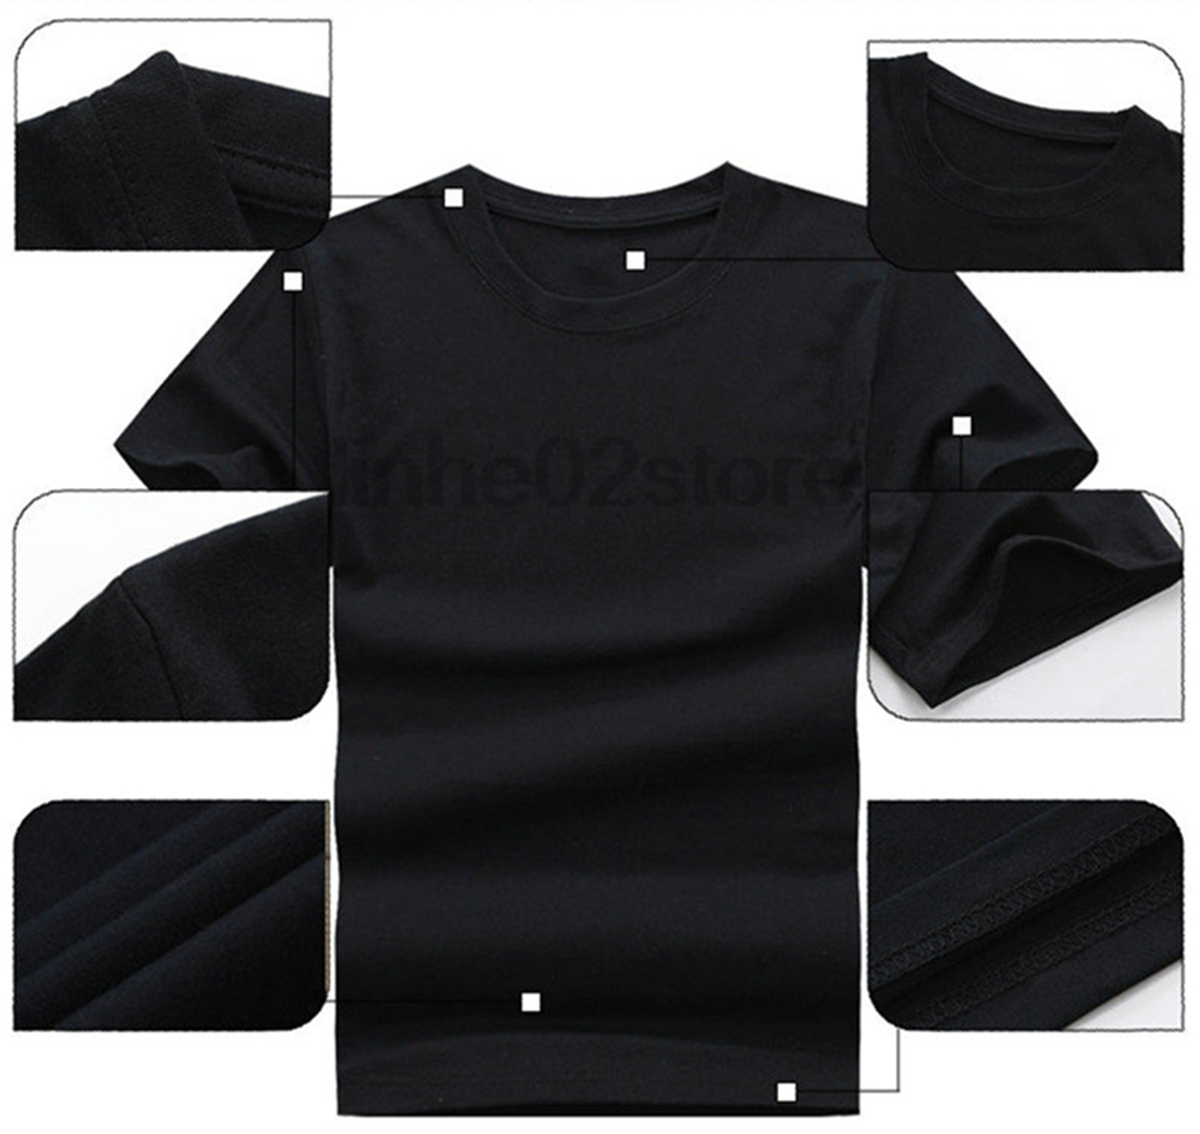 GILDAN I havent failed. Great Thomas Edison memorial tee. dress T-shirt Womens T-shirt